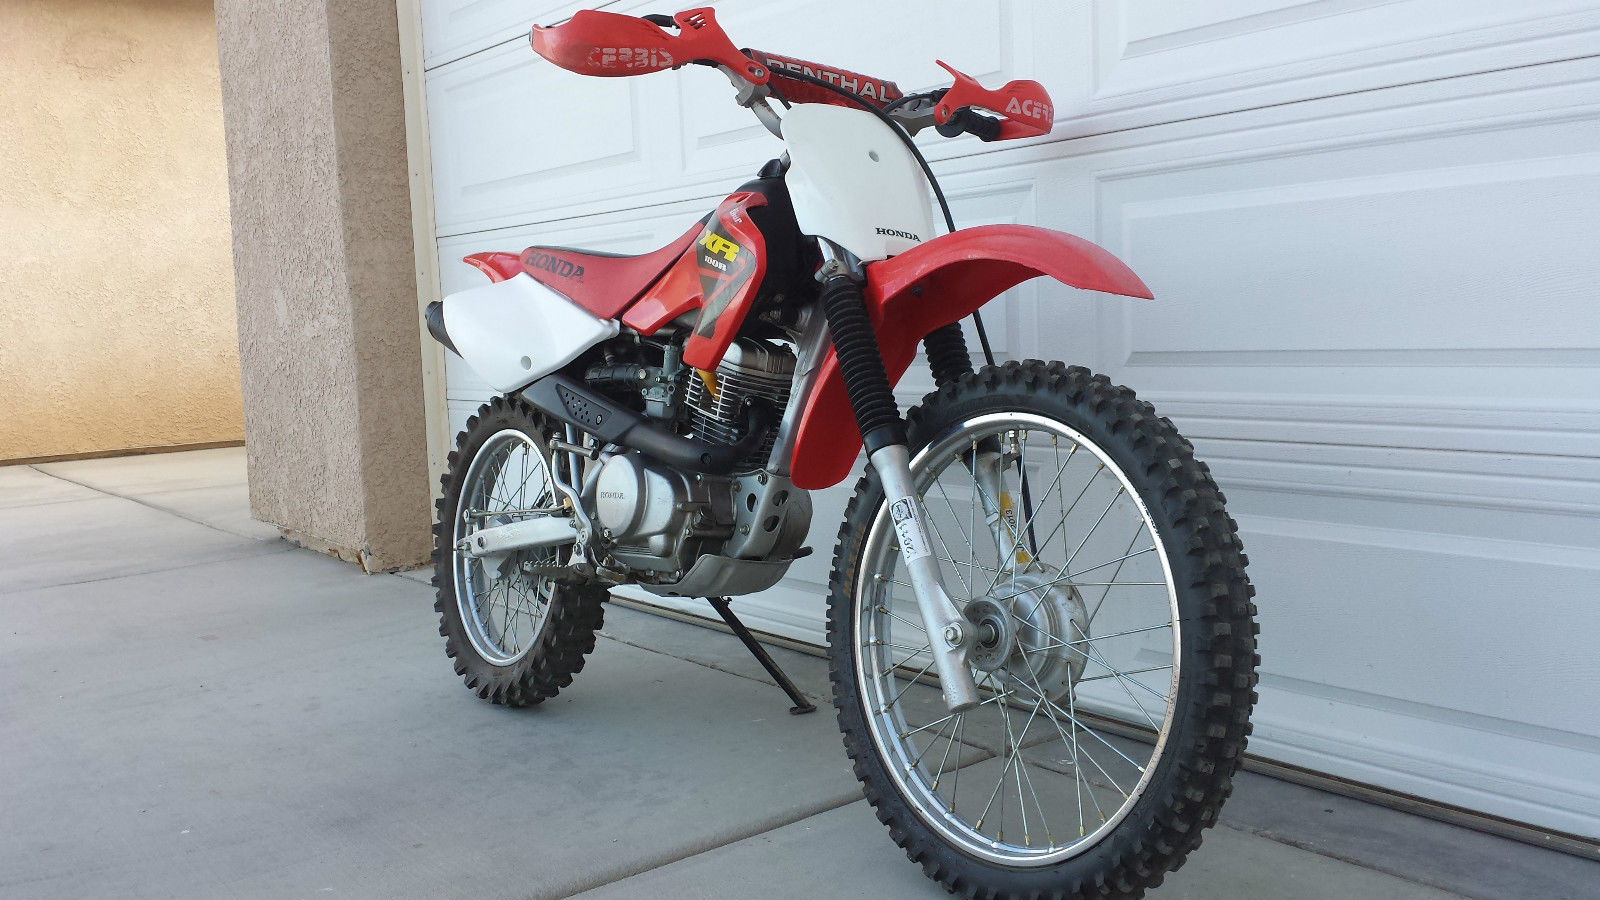 2003 Honda Xr100r Dirt Bike Just Rebuilt Engine With New Top End Runs Like New